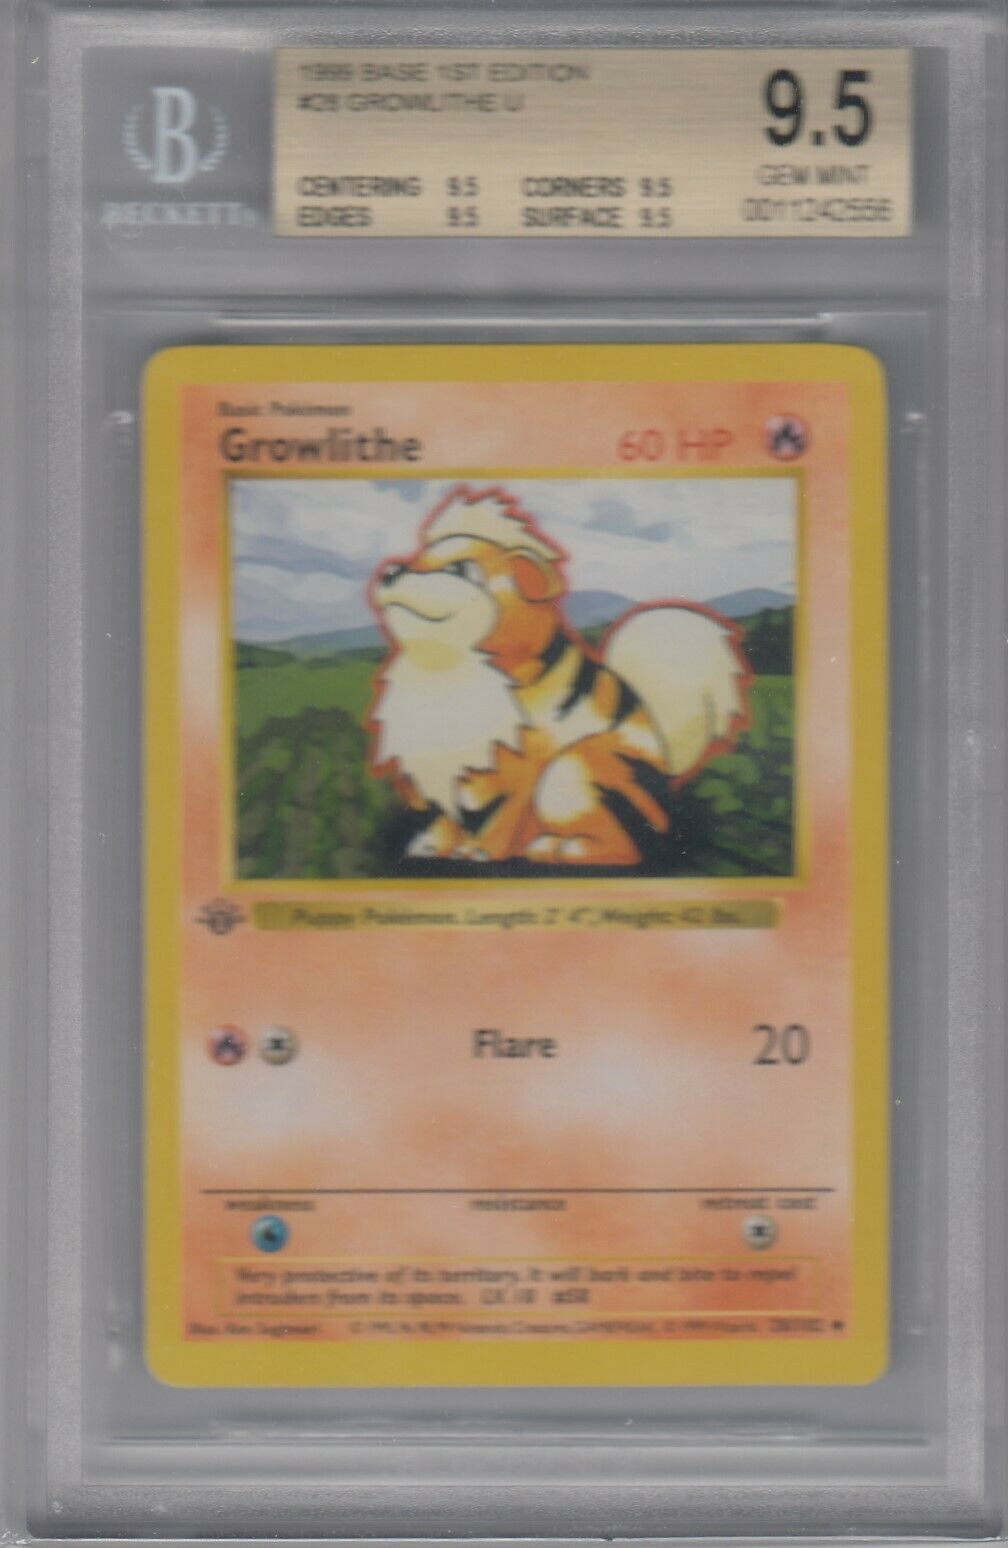 Growlithe 28   102 Pocket de base para duendes, primera edición  sin sombra  BGS 9.5 gemas de menta